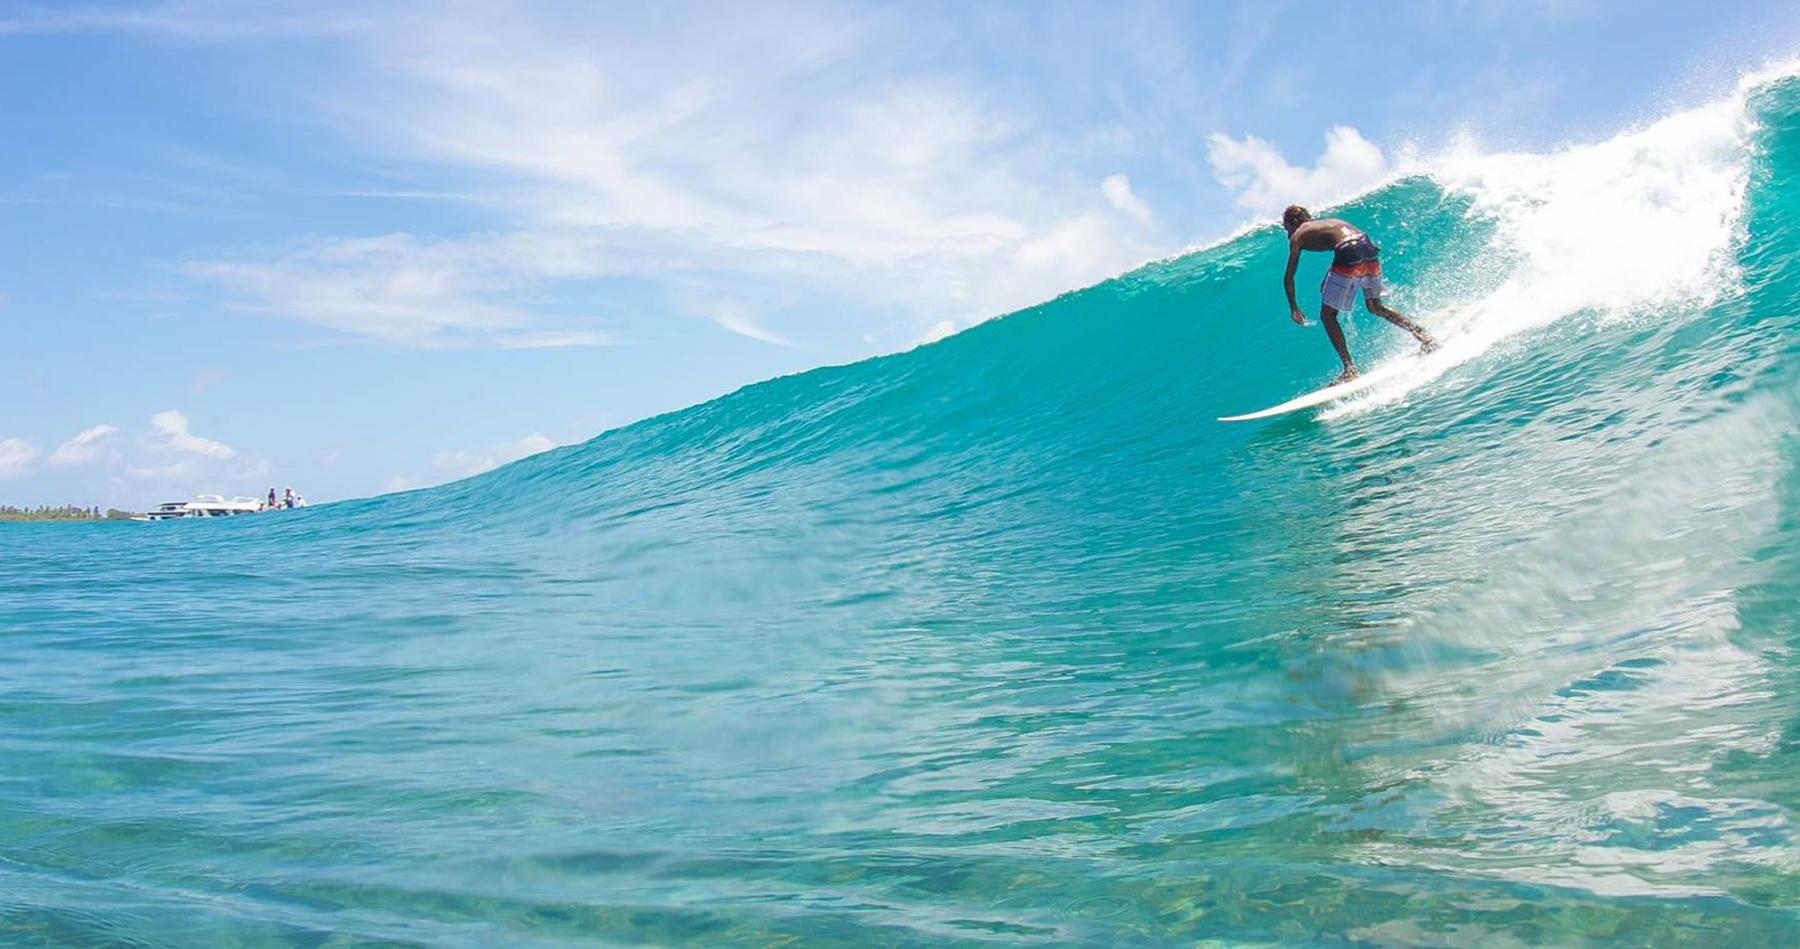 Himmafushi Budget Maldives Surf Camp (Jailbreaks)